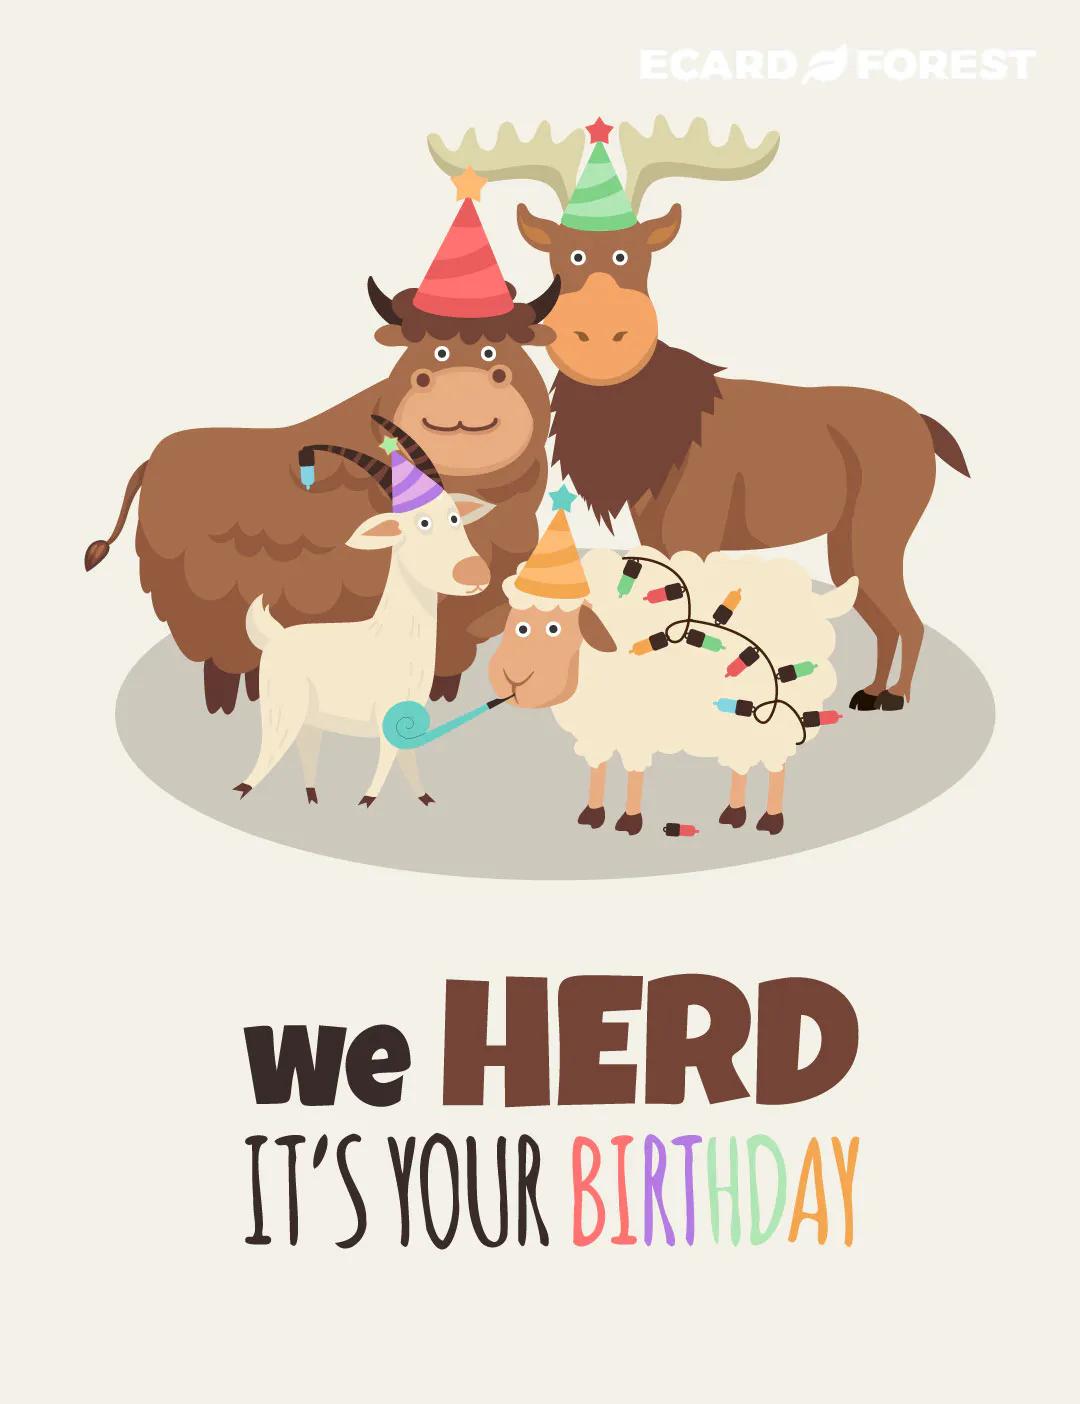 Happy birthday group greeting card